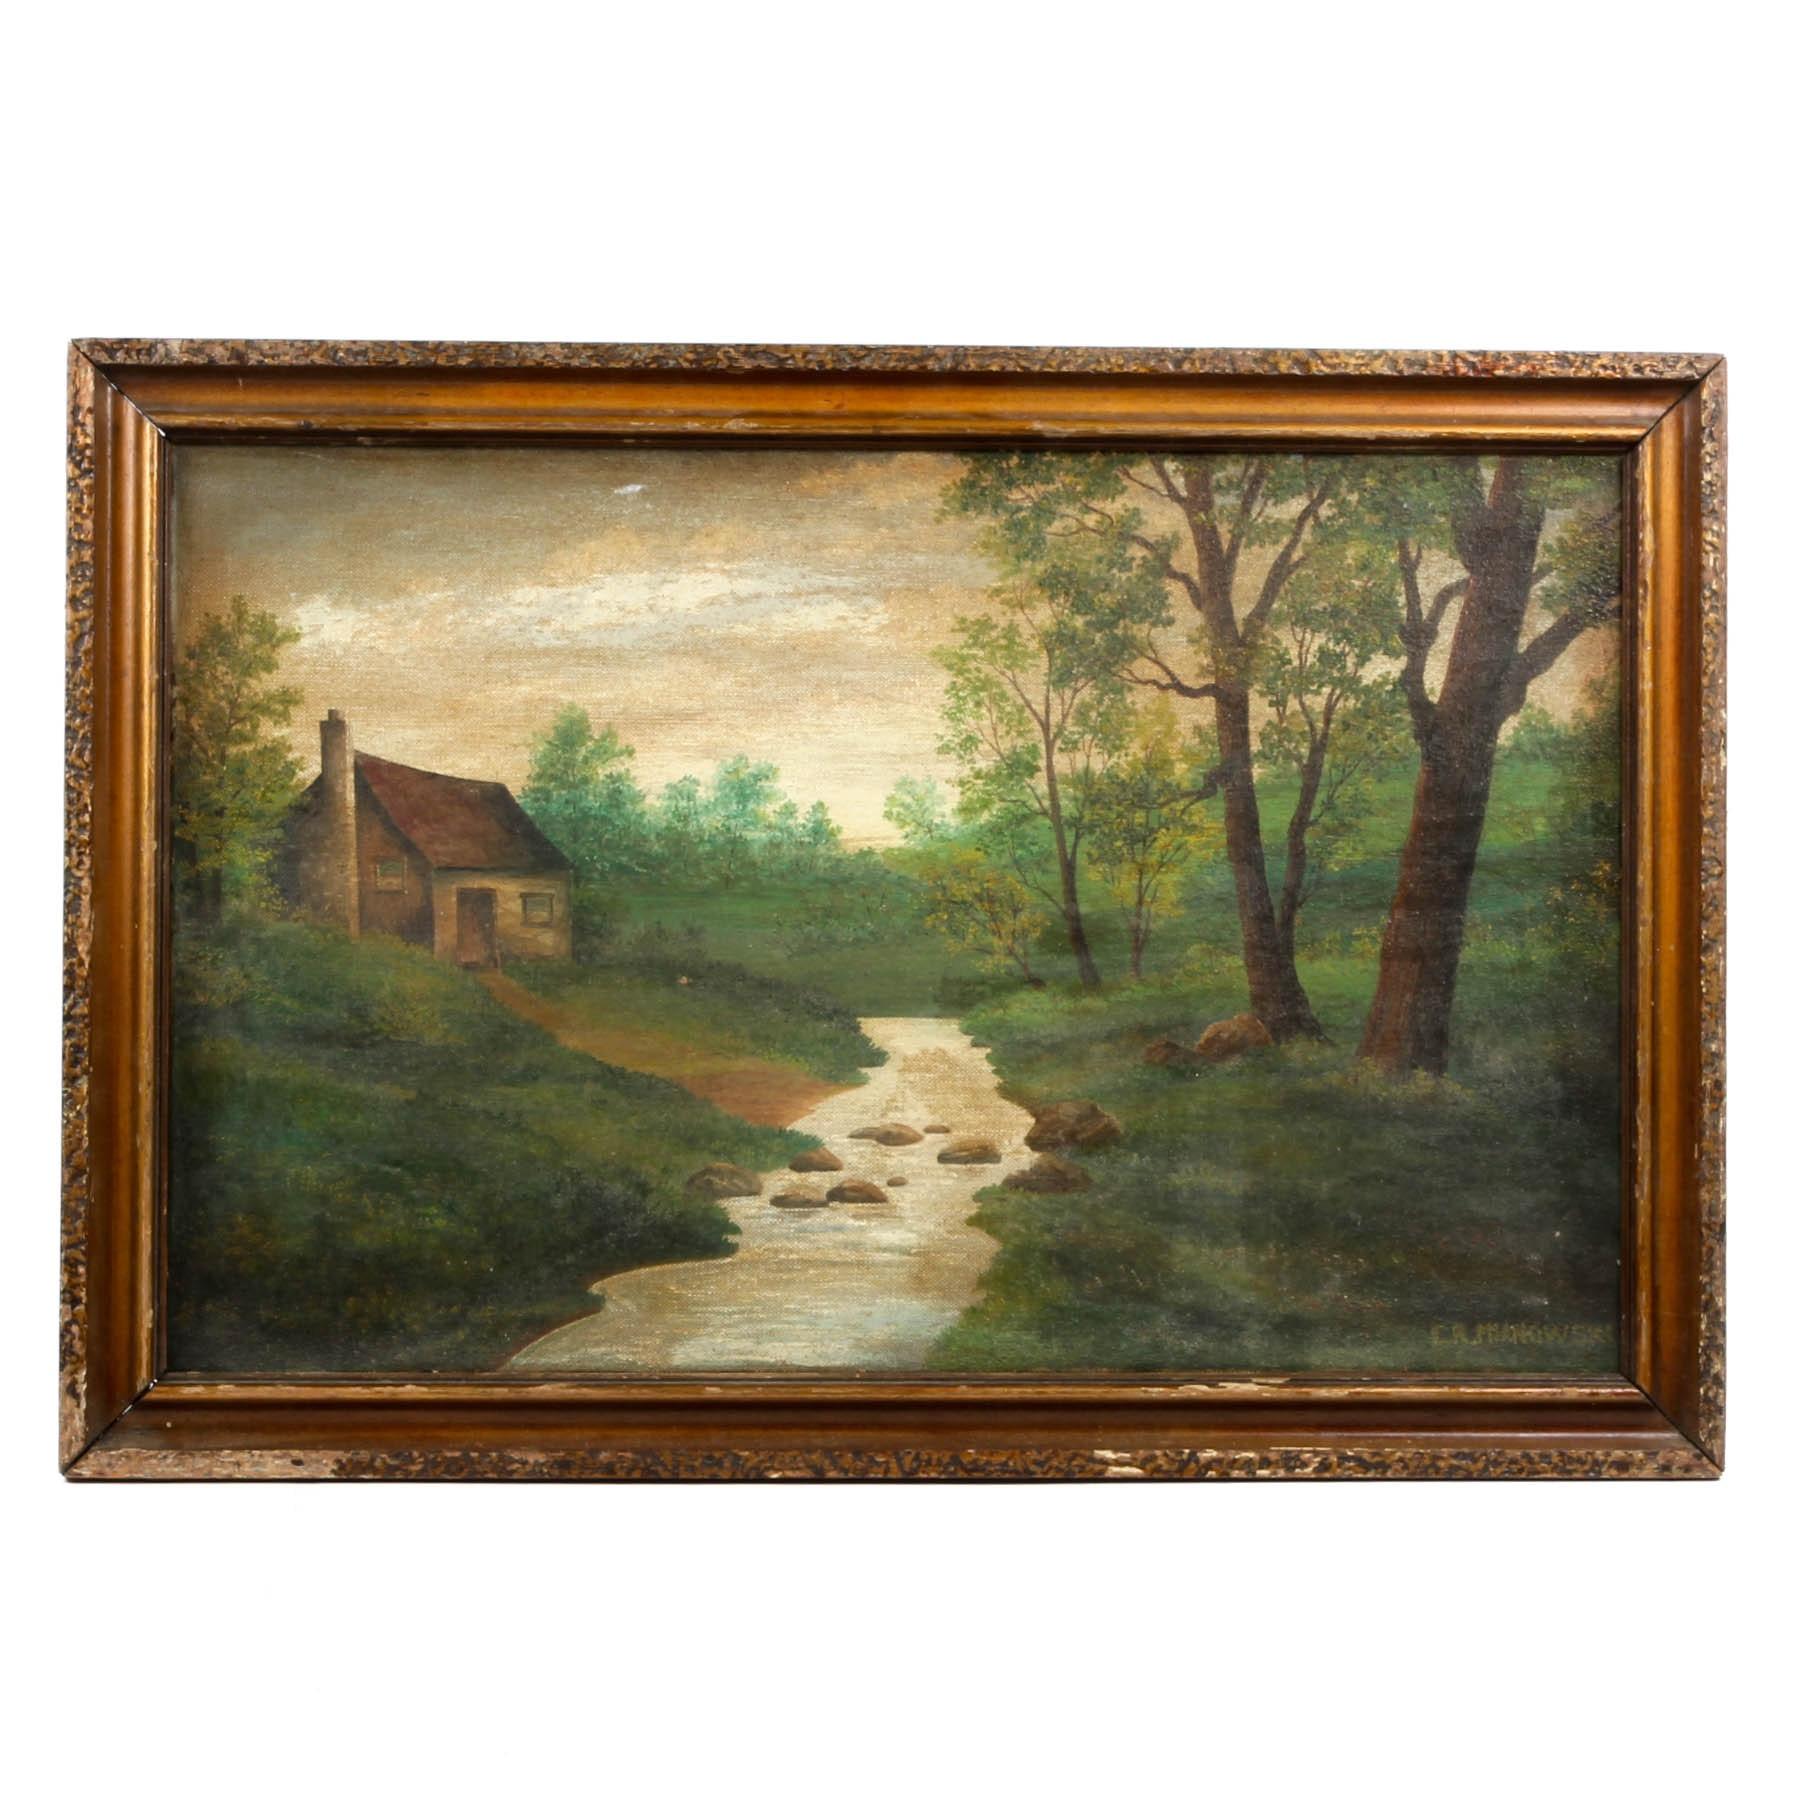 C.R. Mianowski Oil Painting of Rural Landscape